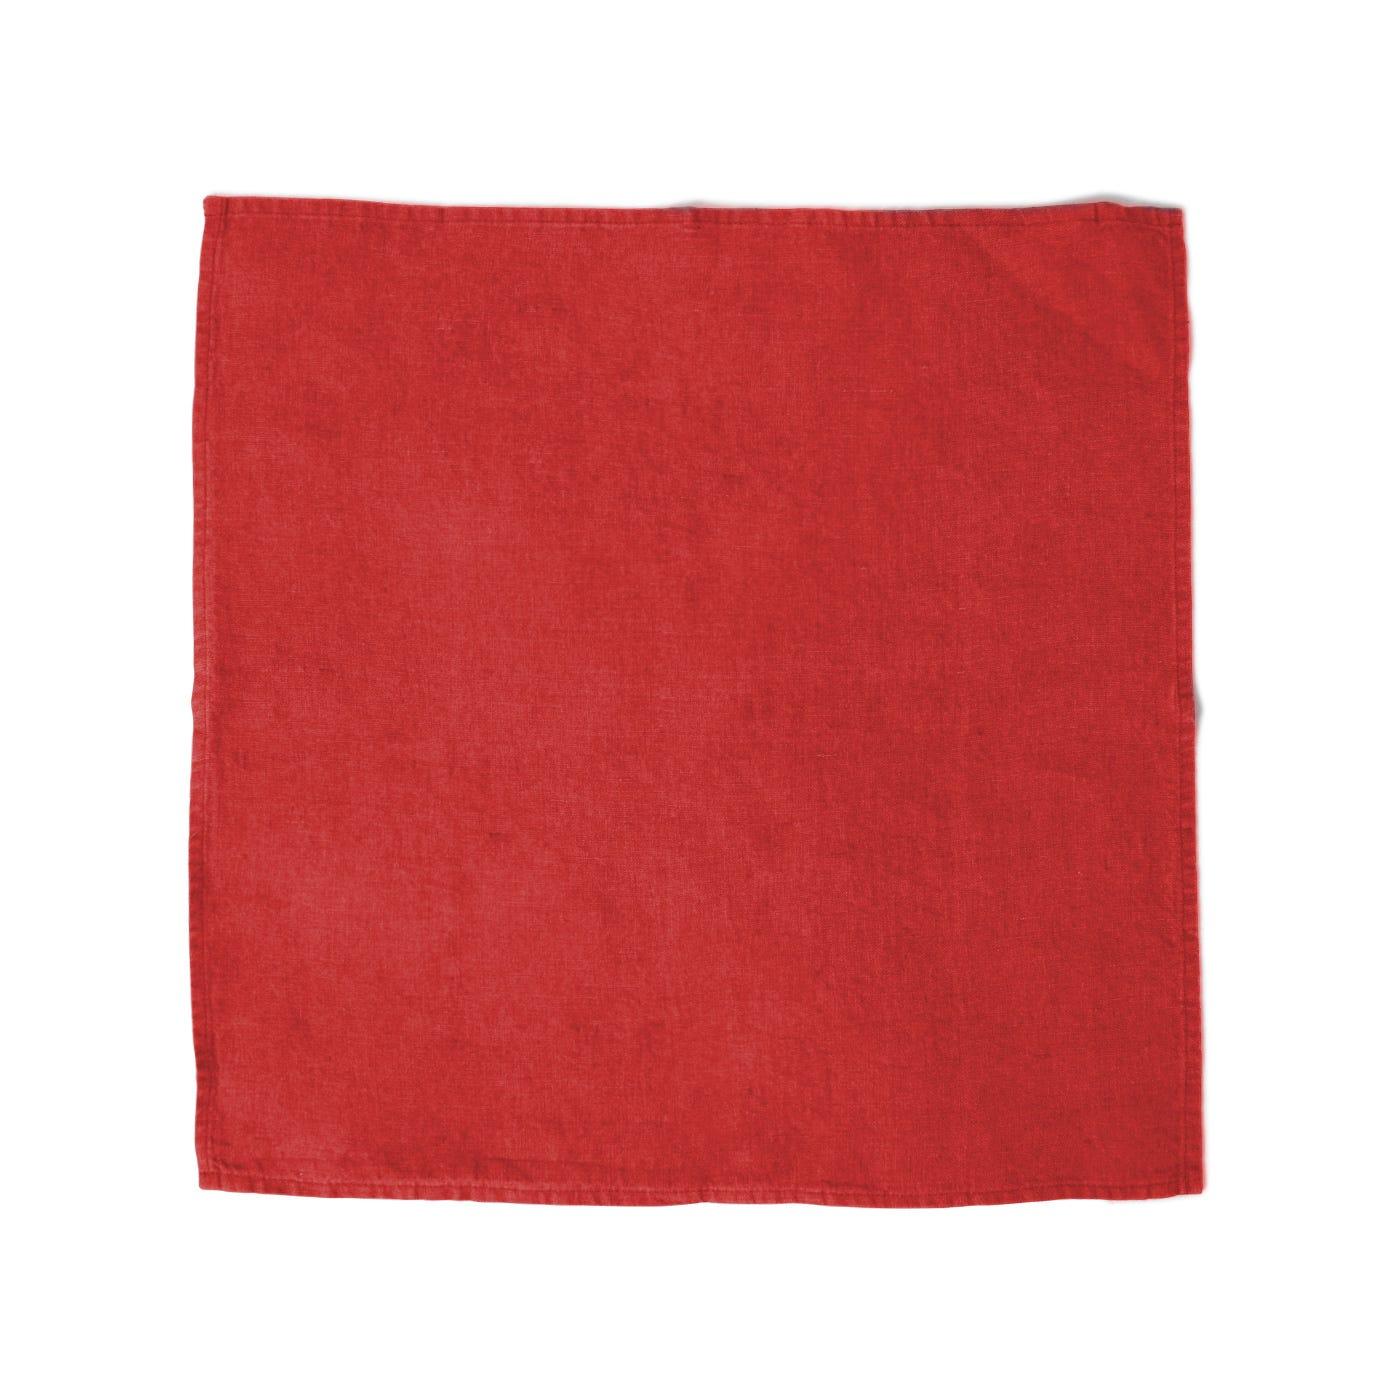 Heal's Linen Napkin